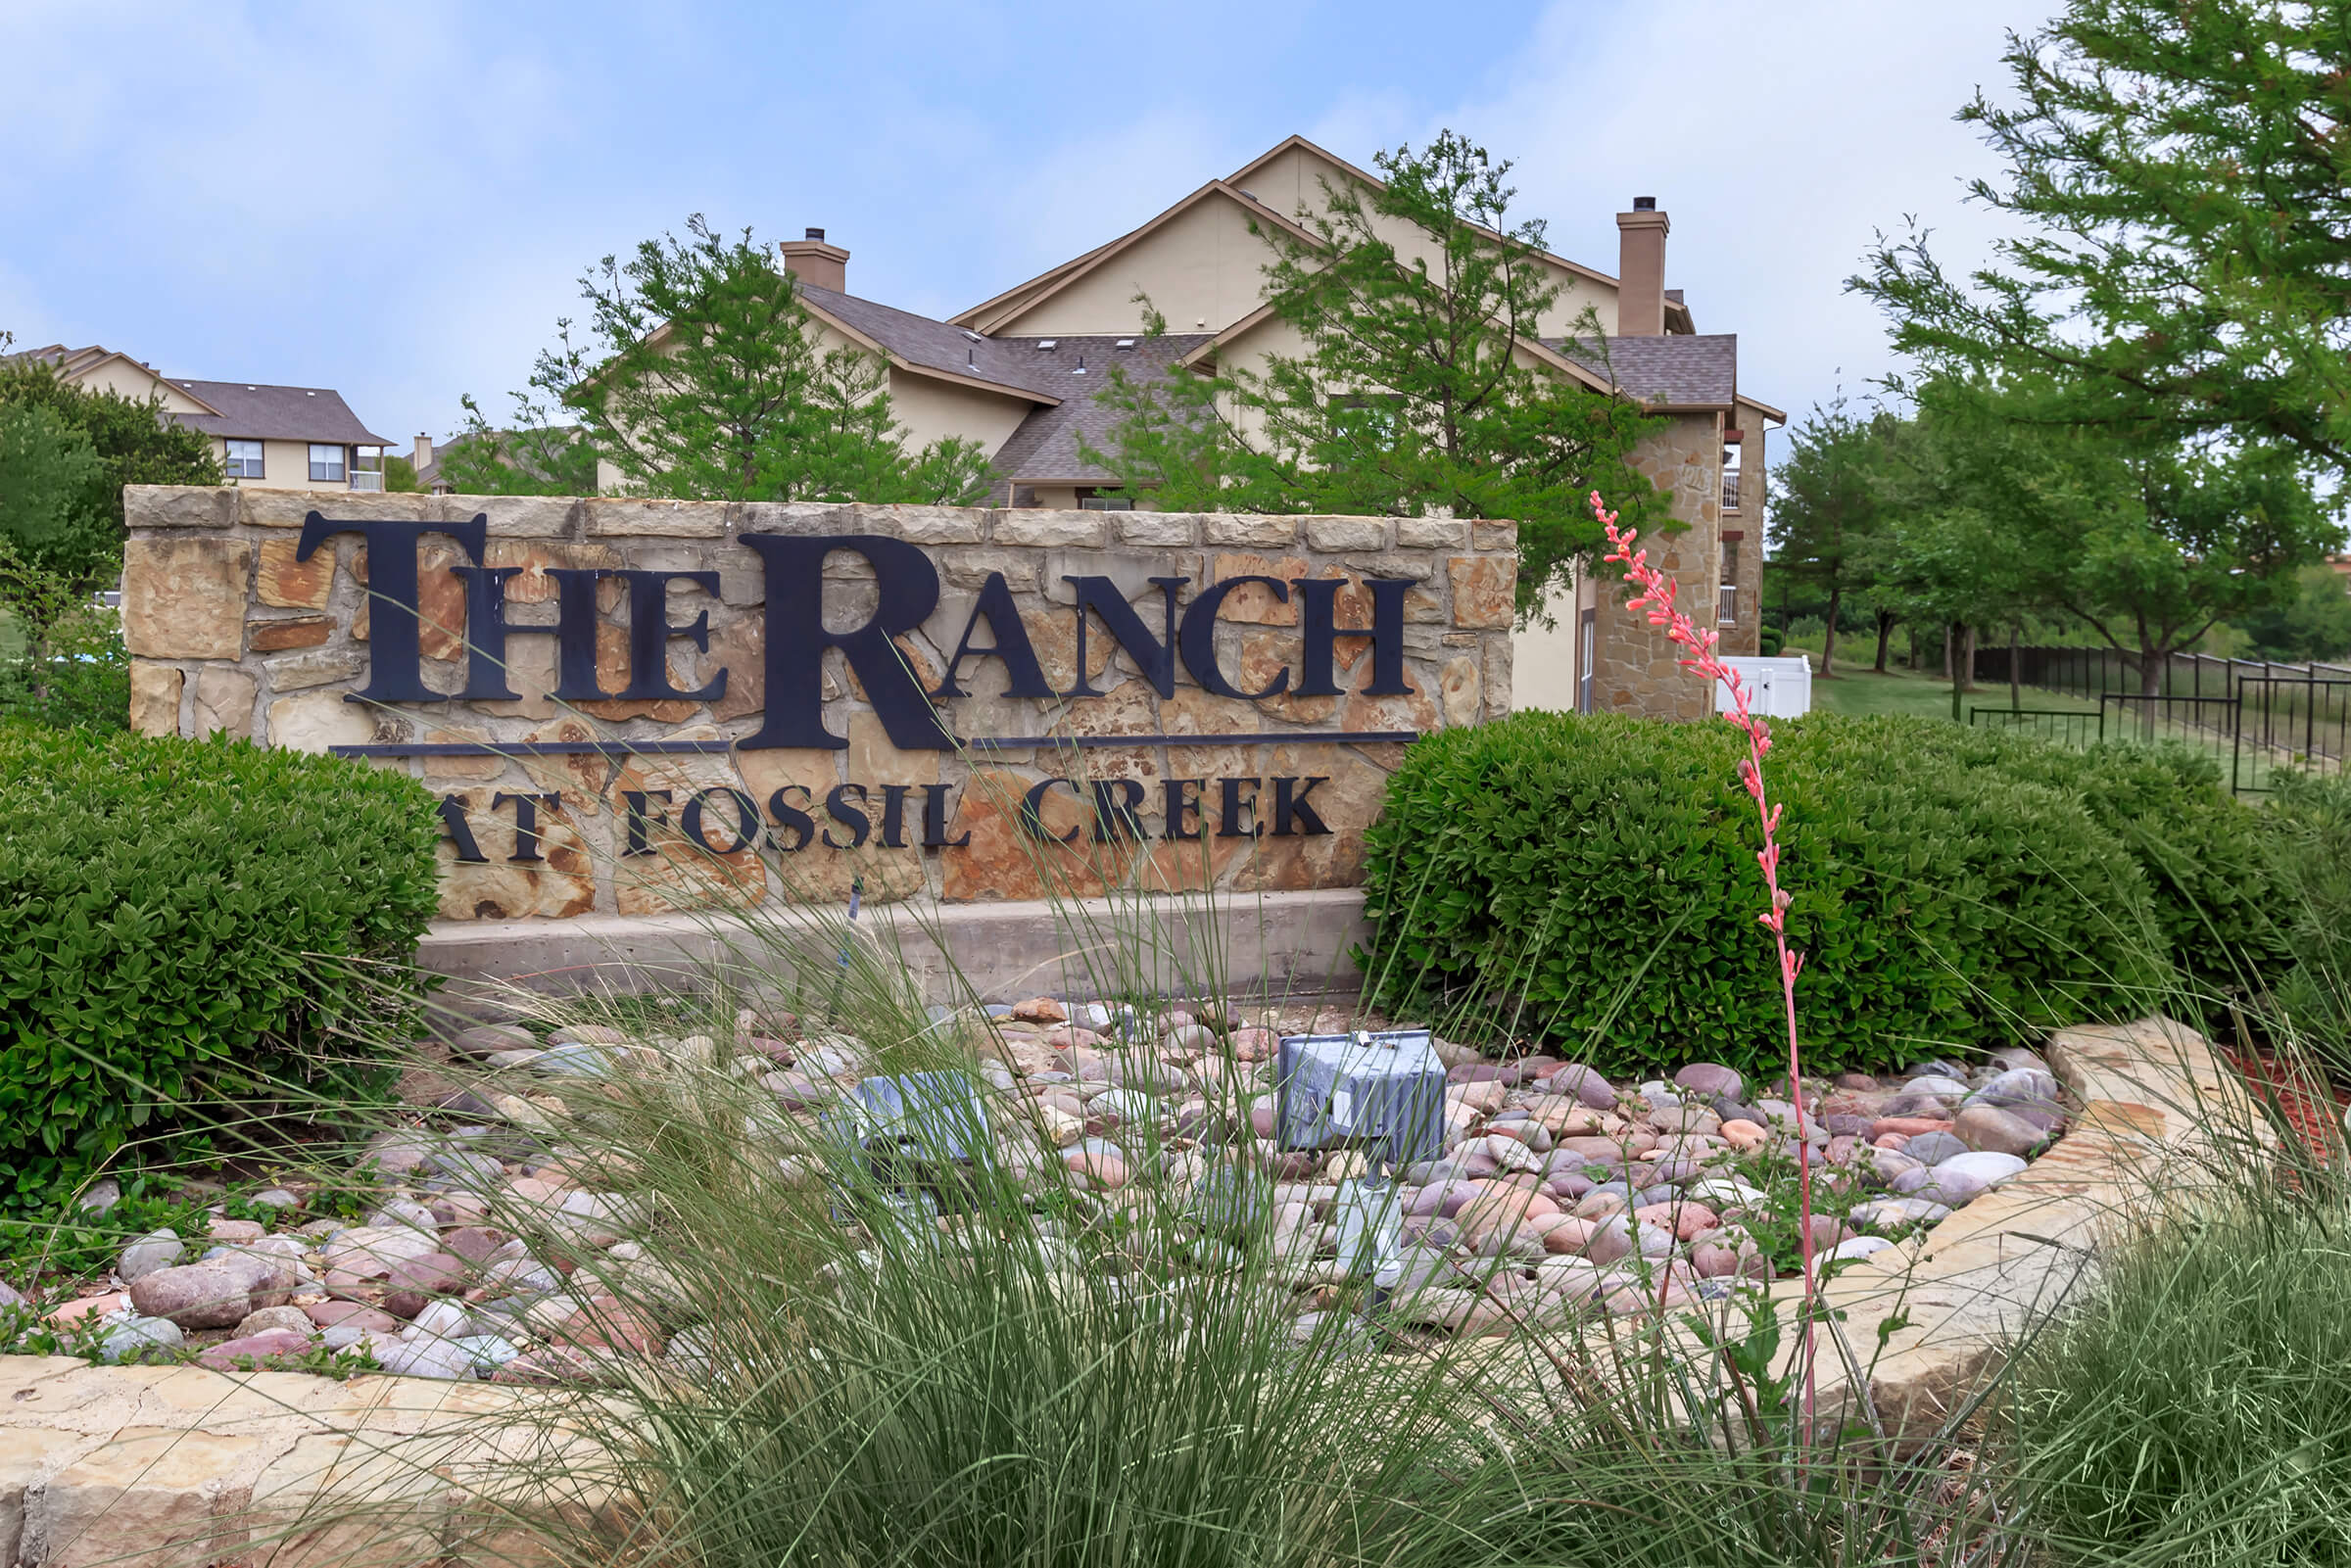 Ranch at Fossil Creek